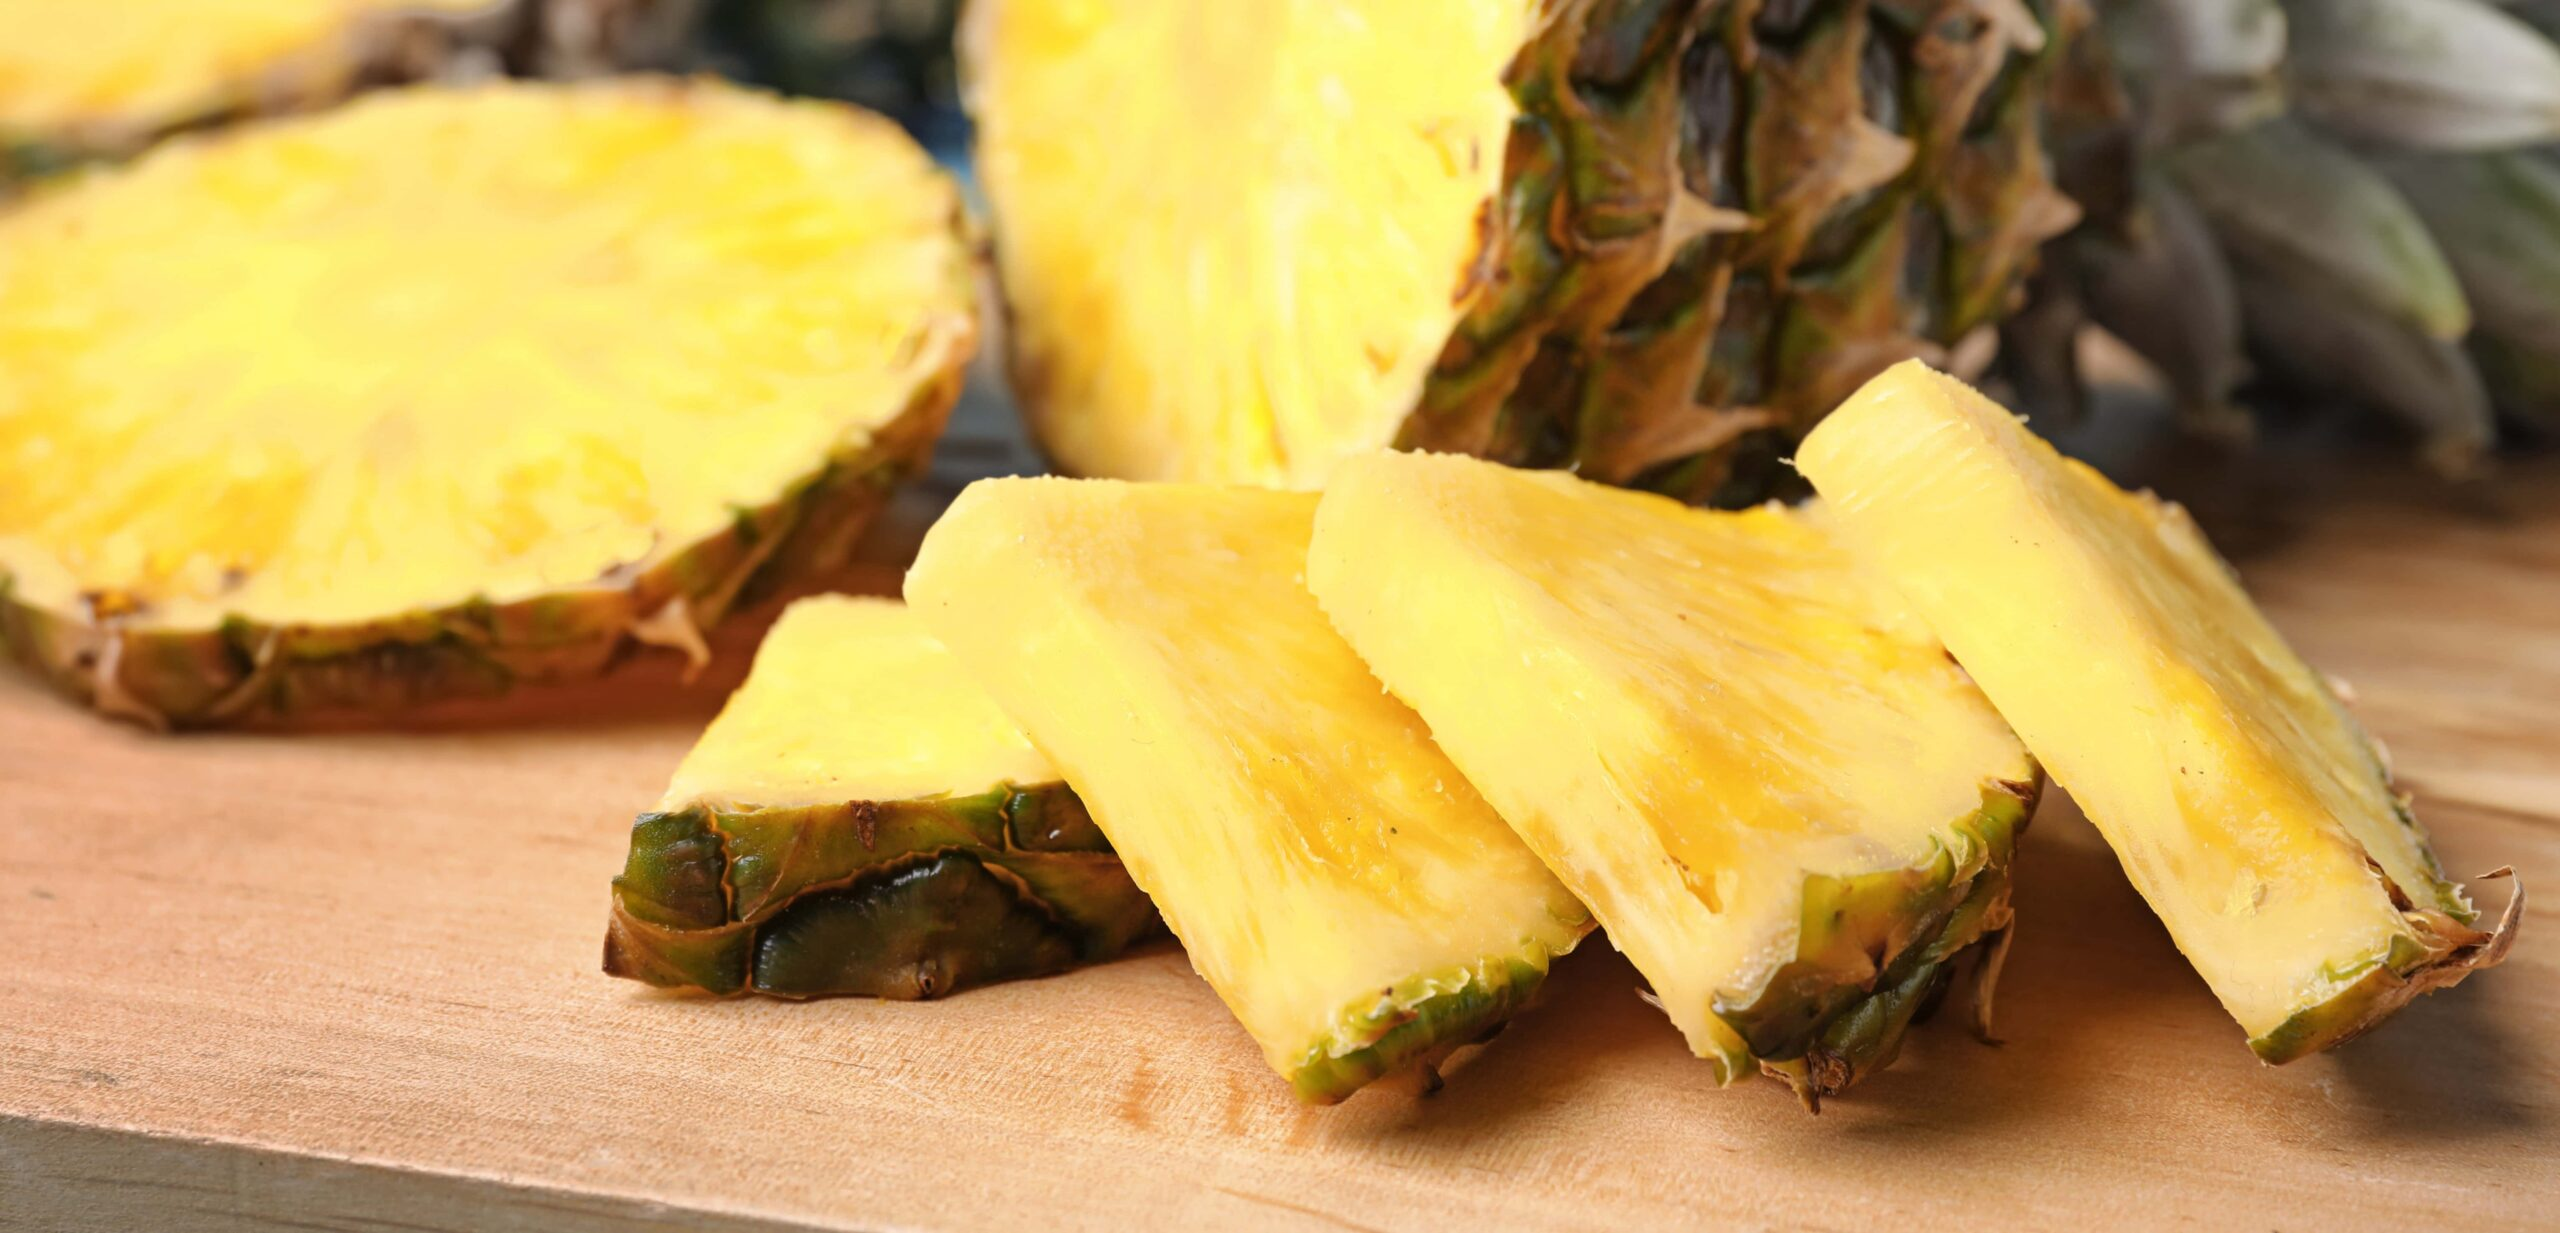 ananas benefici e proprietà a dieta